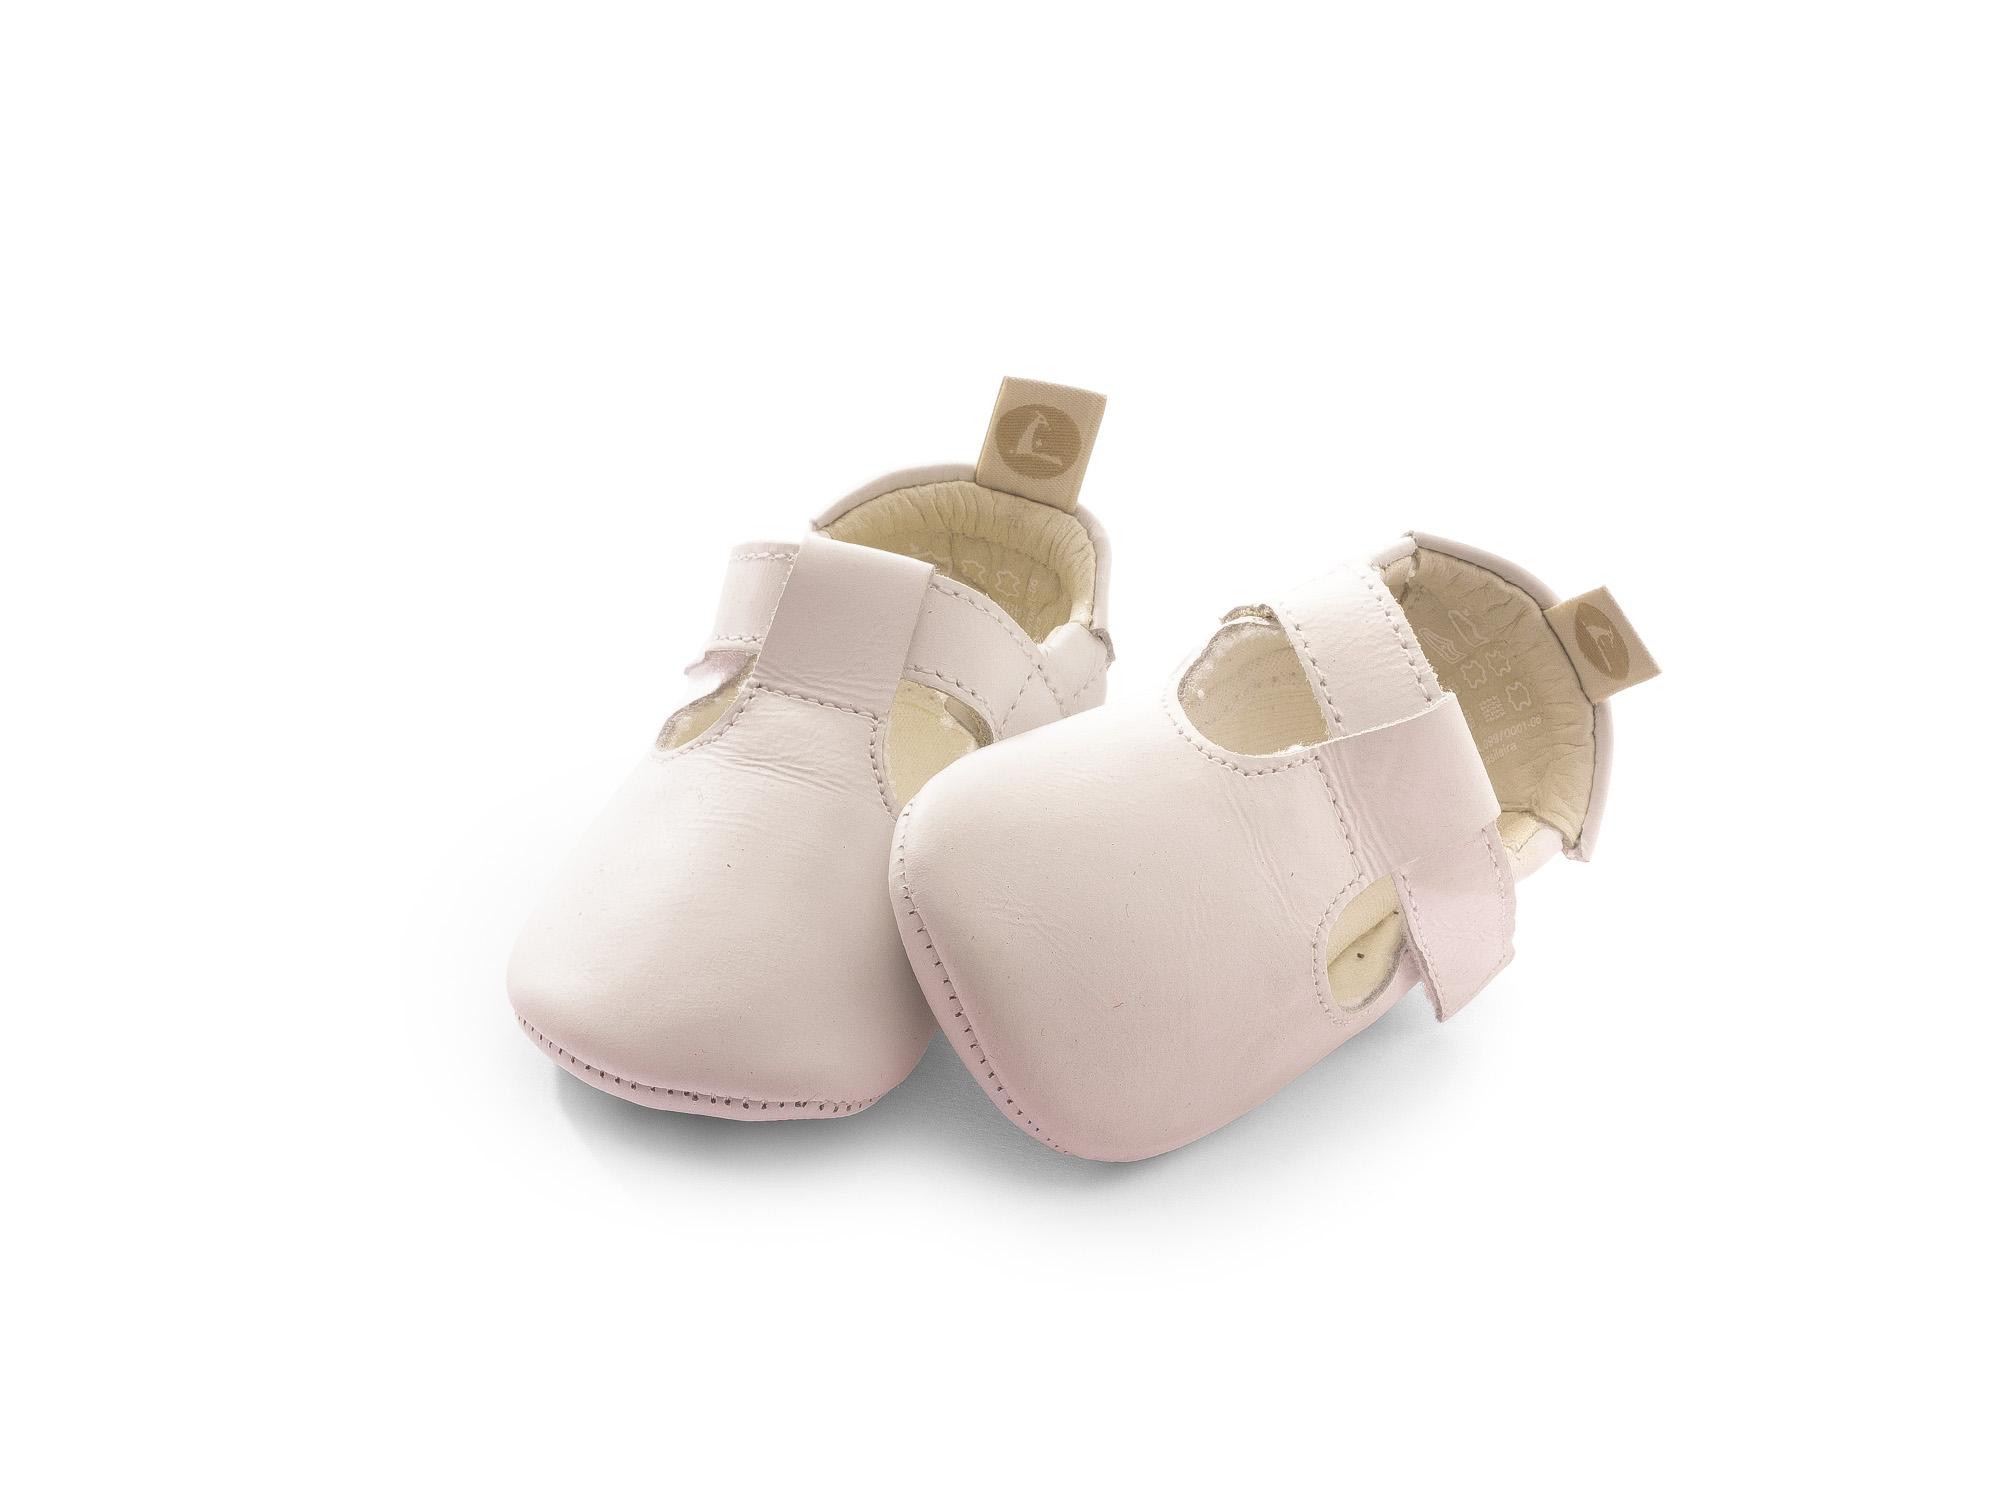 Boneca Love Cotton Candy Baby 0 à 2 anos - 1